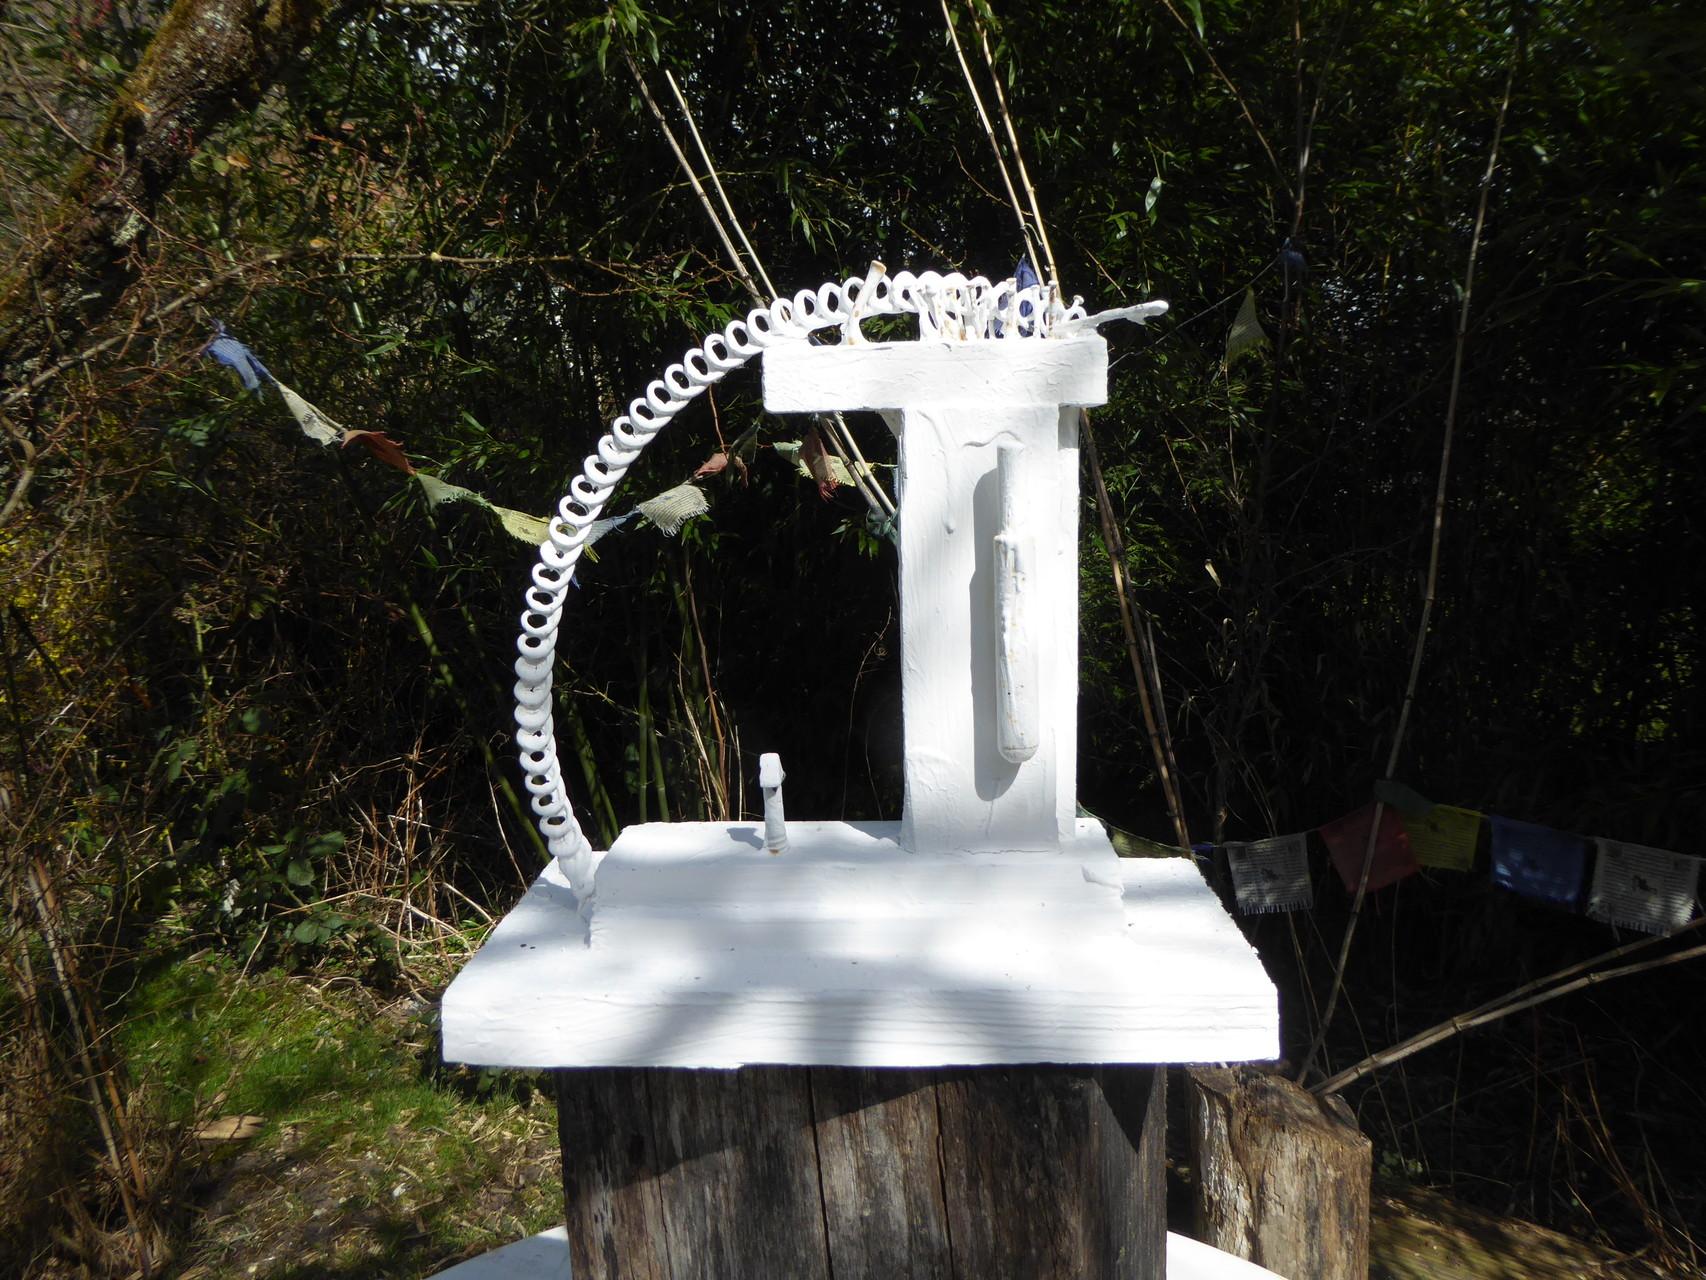 Pedro Meier – Skulptur aus Holz und Metall – weiss übermalt 2015 – Atelier-Garten – Photo © Pedro Meier Multimedia Artist / ProLitteris Gerhard Meier Weg Niederbipp – (Atelier: Niederbipp – Olten – Bangkok)